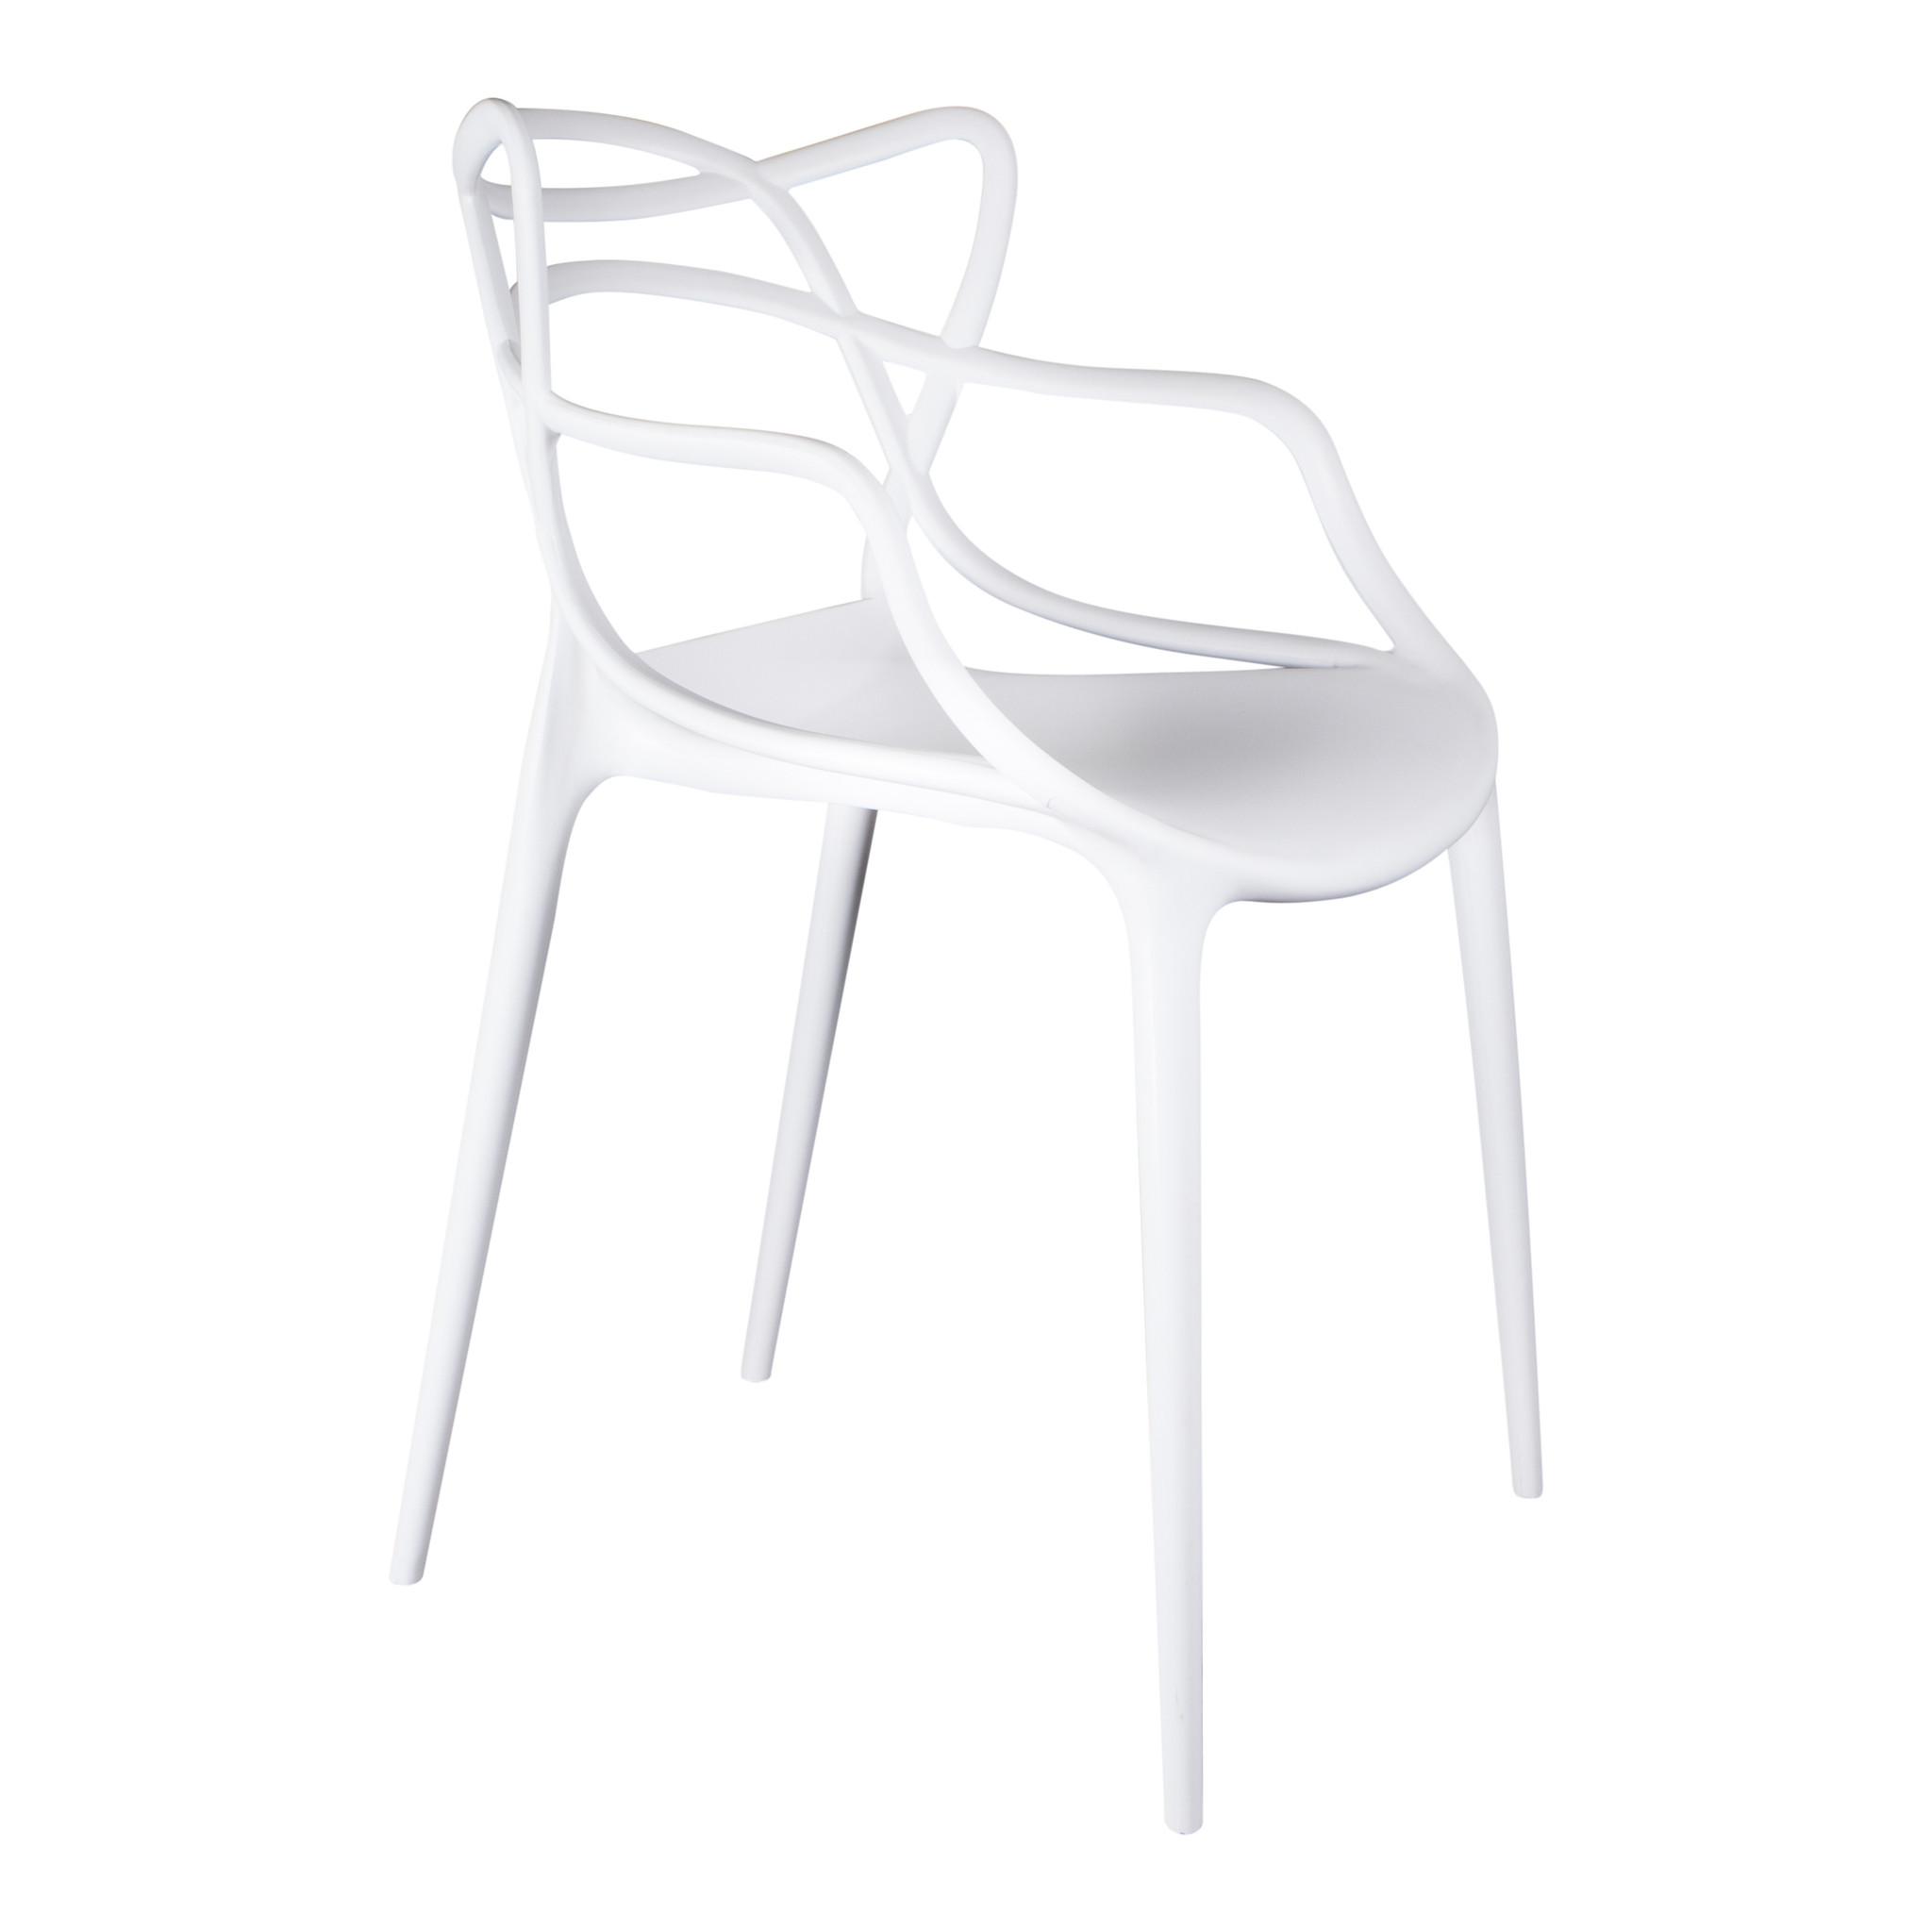 Design Stoelen Kartell.Cheap Design Chairs Replica Kartell Chair Masters